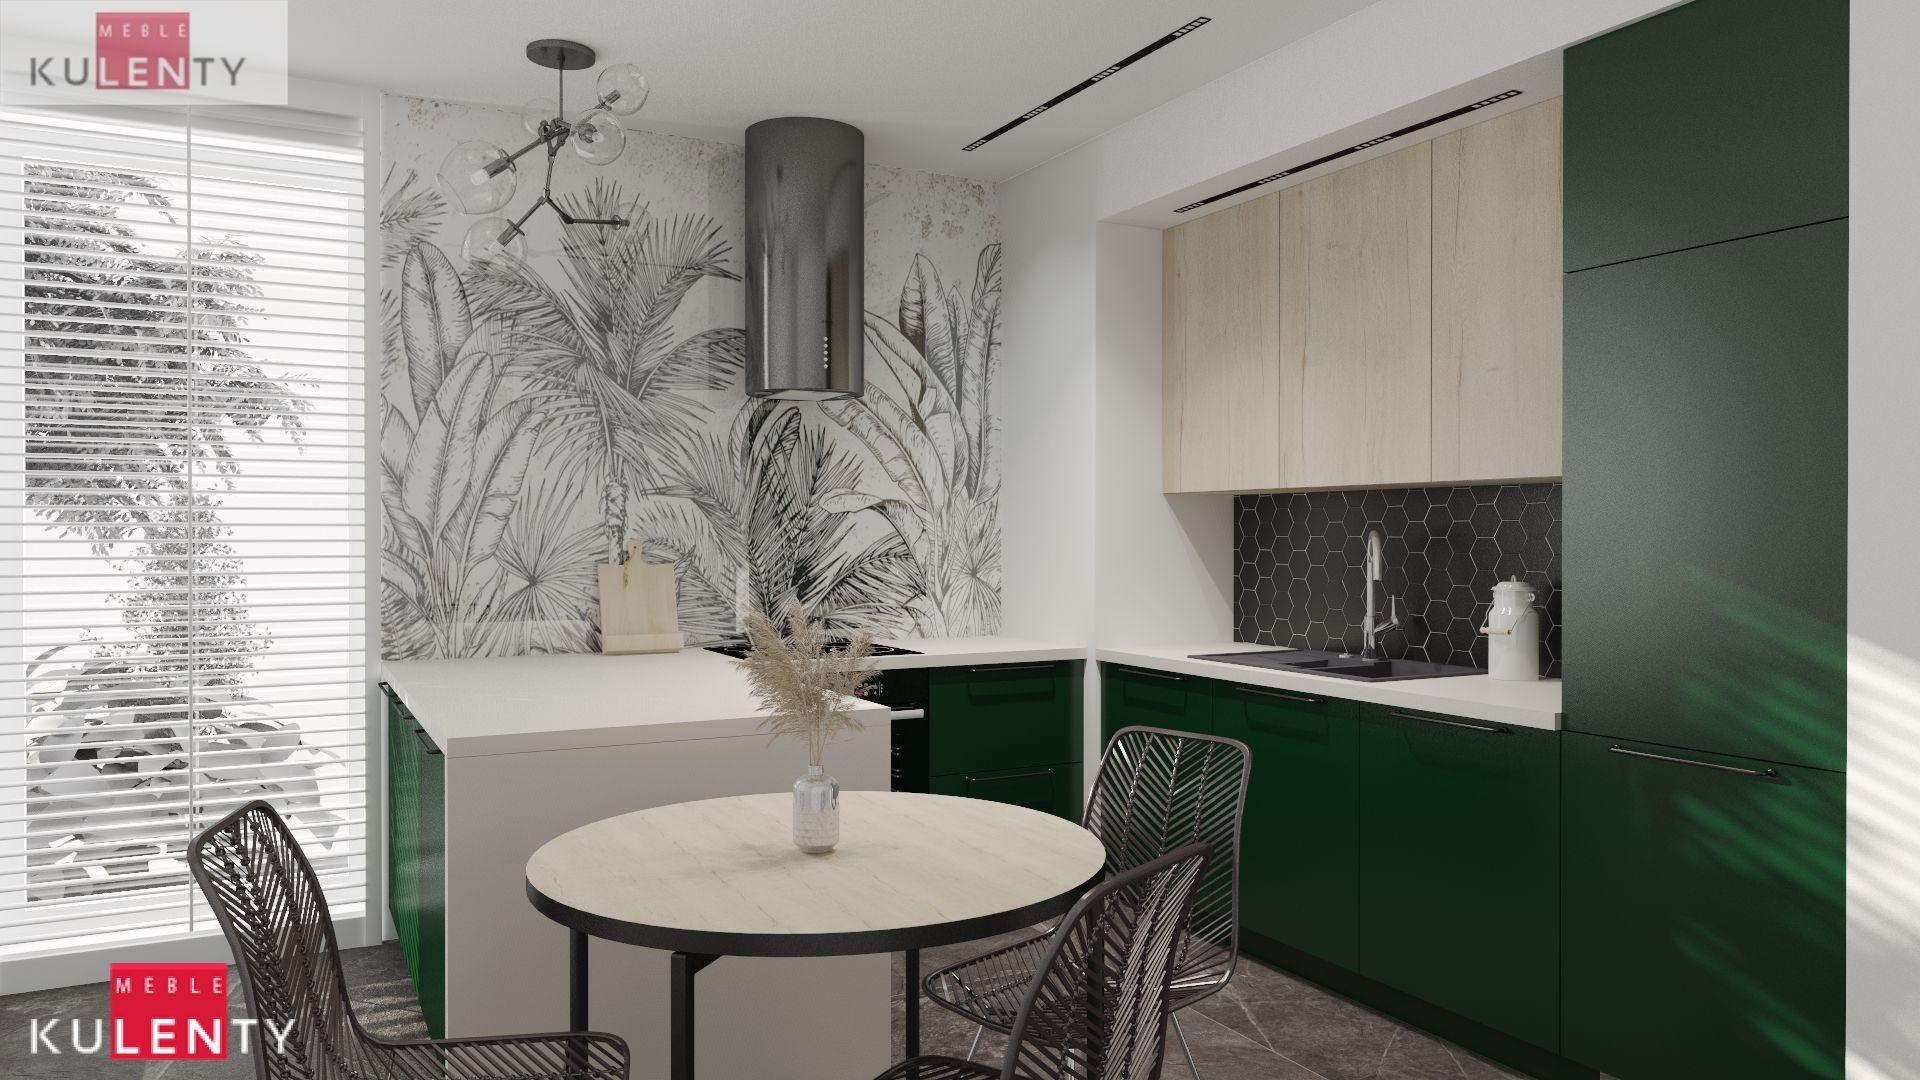 Kolory ziemi w kuchni 4FuB